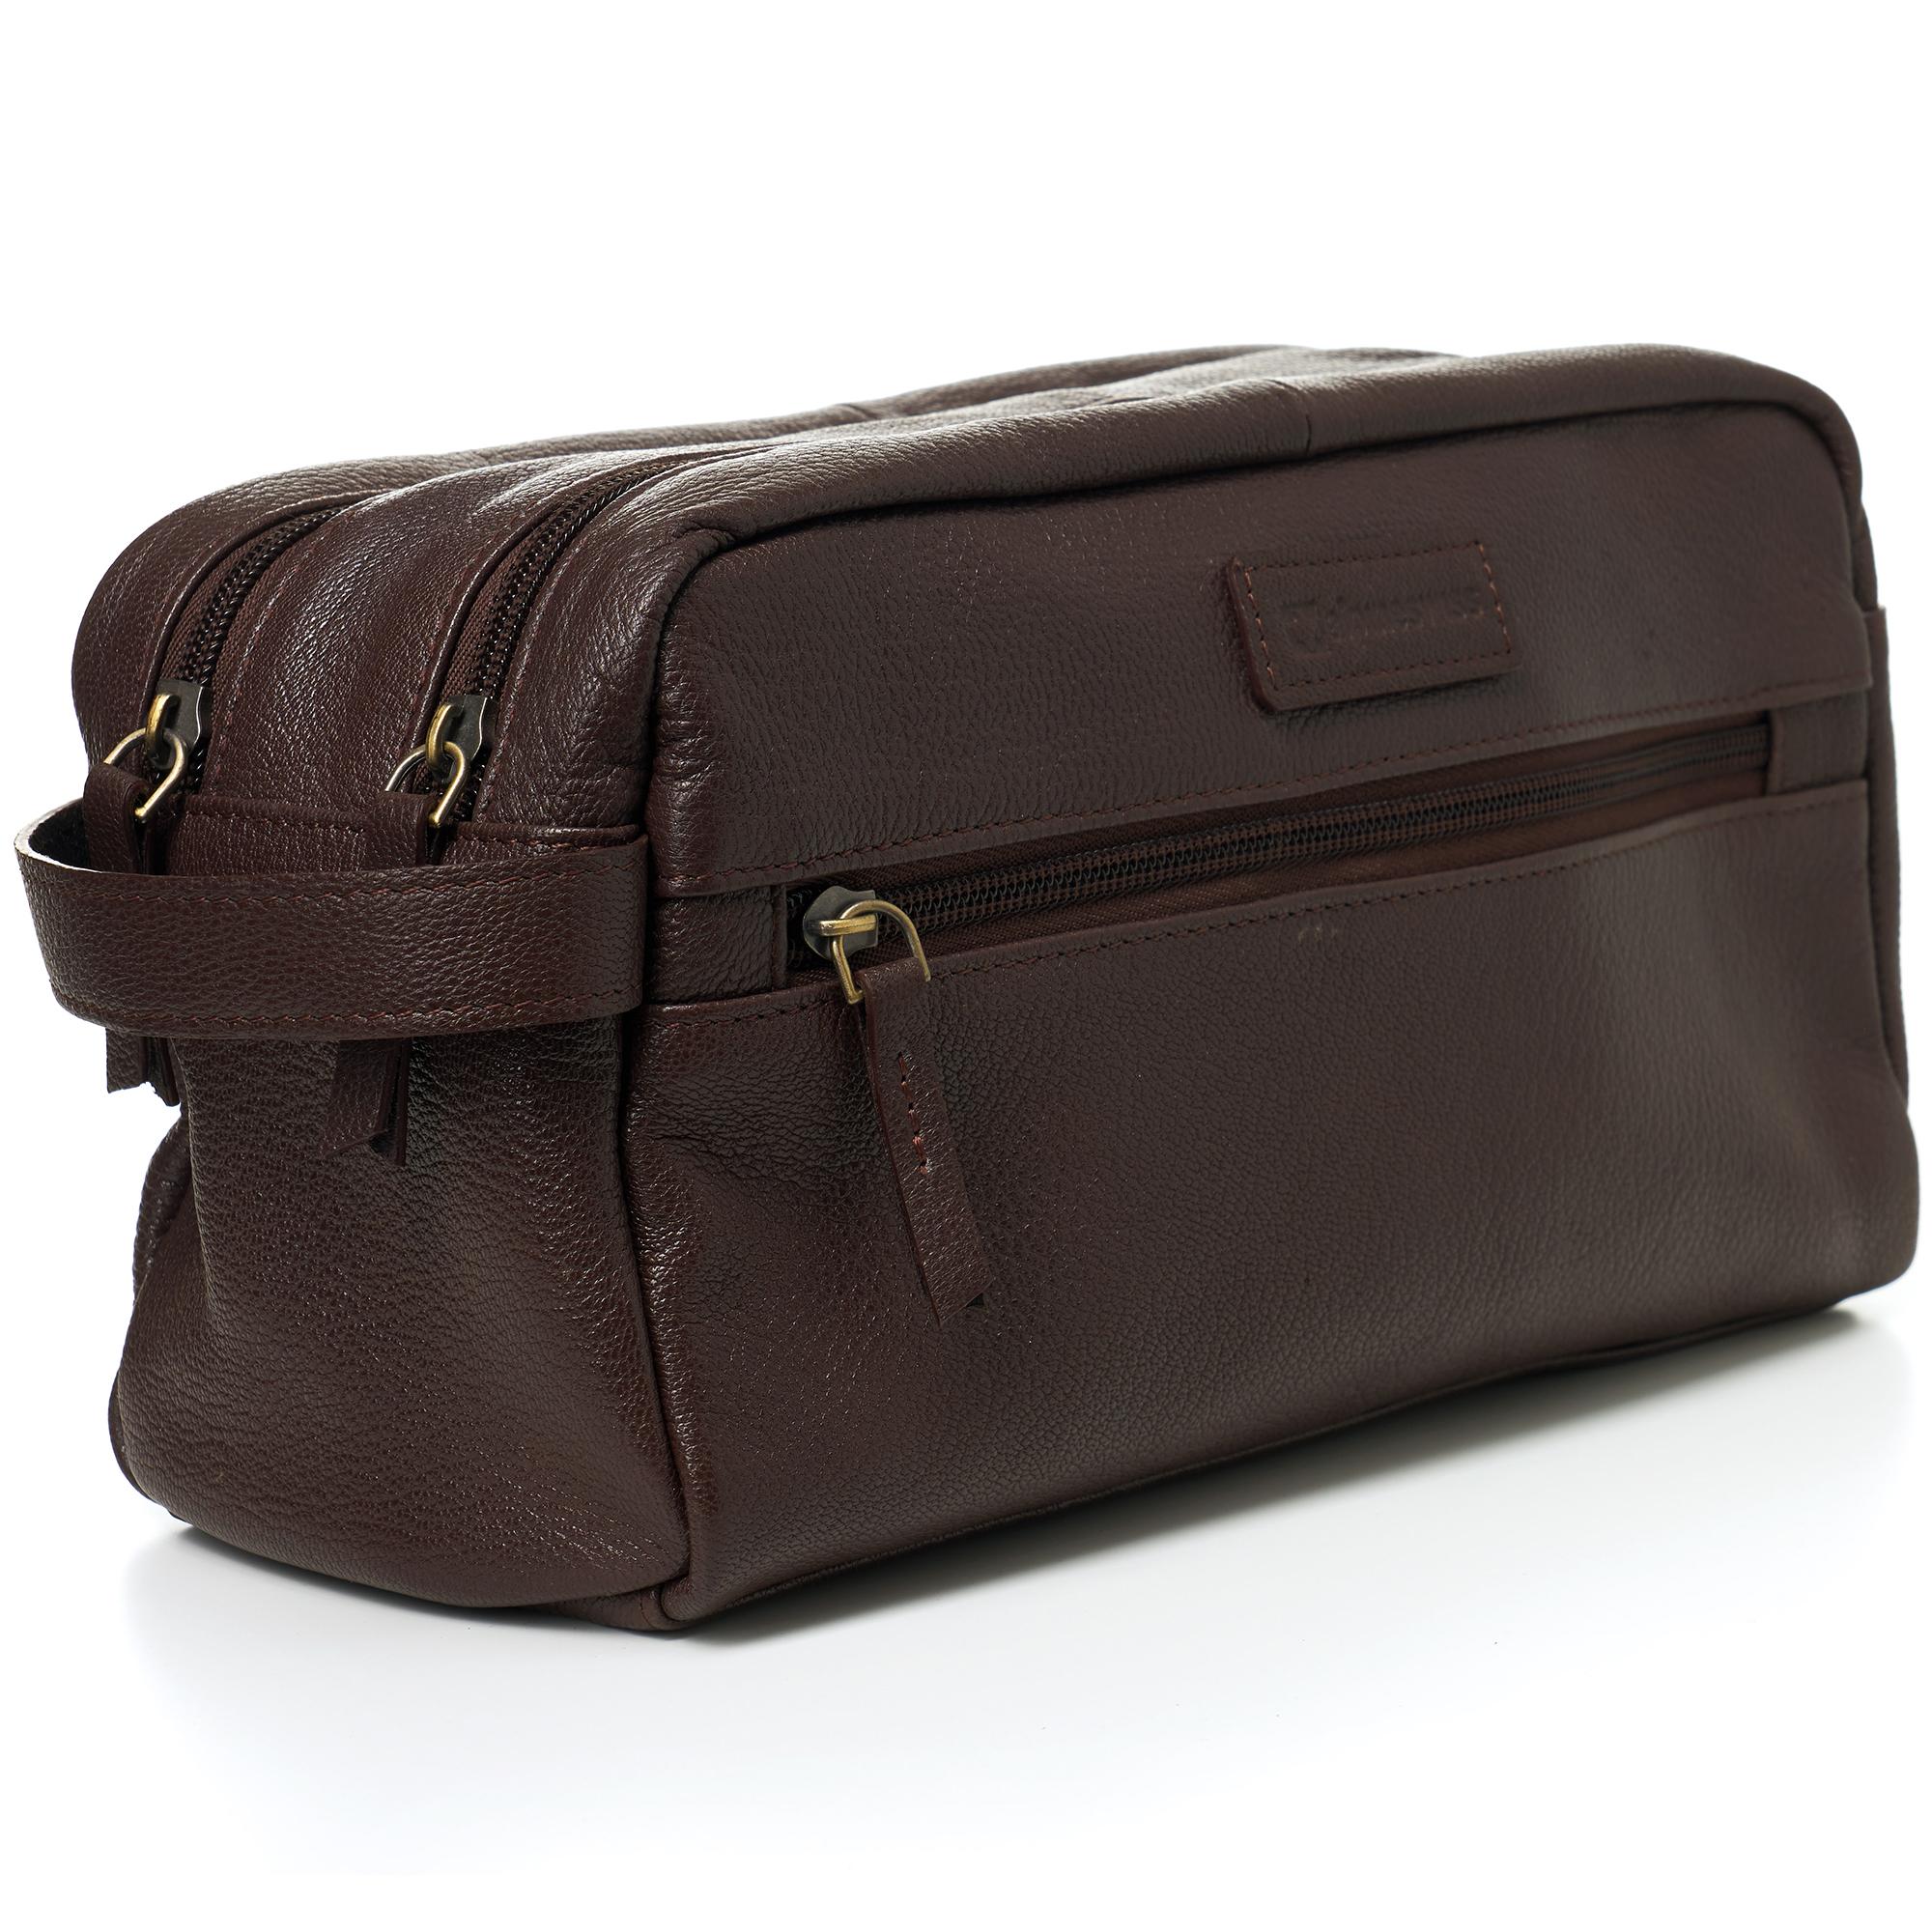 AlpineSwiss-Sedona-Toiletry-Bag-Genuine-Leather-Shaving-Kit-Dopp-Kit-Travel-Case thumbnail 20